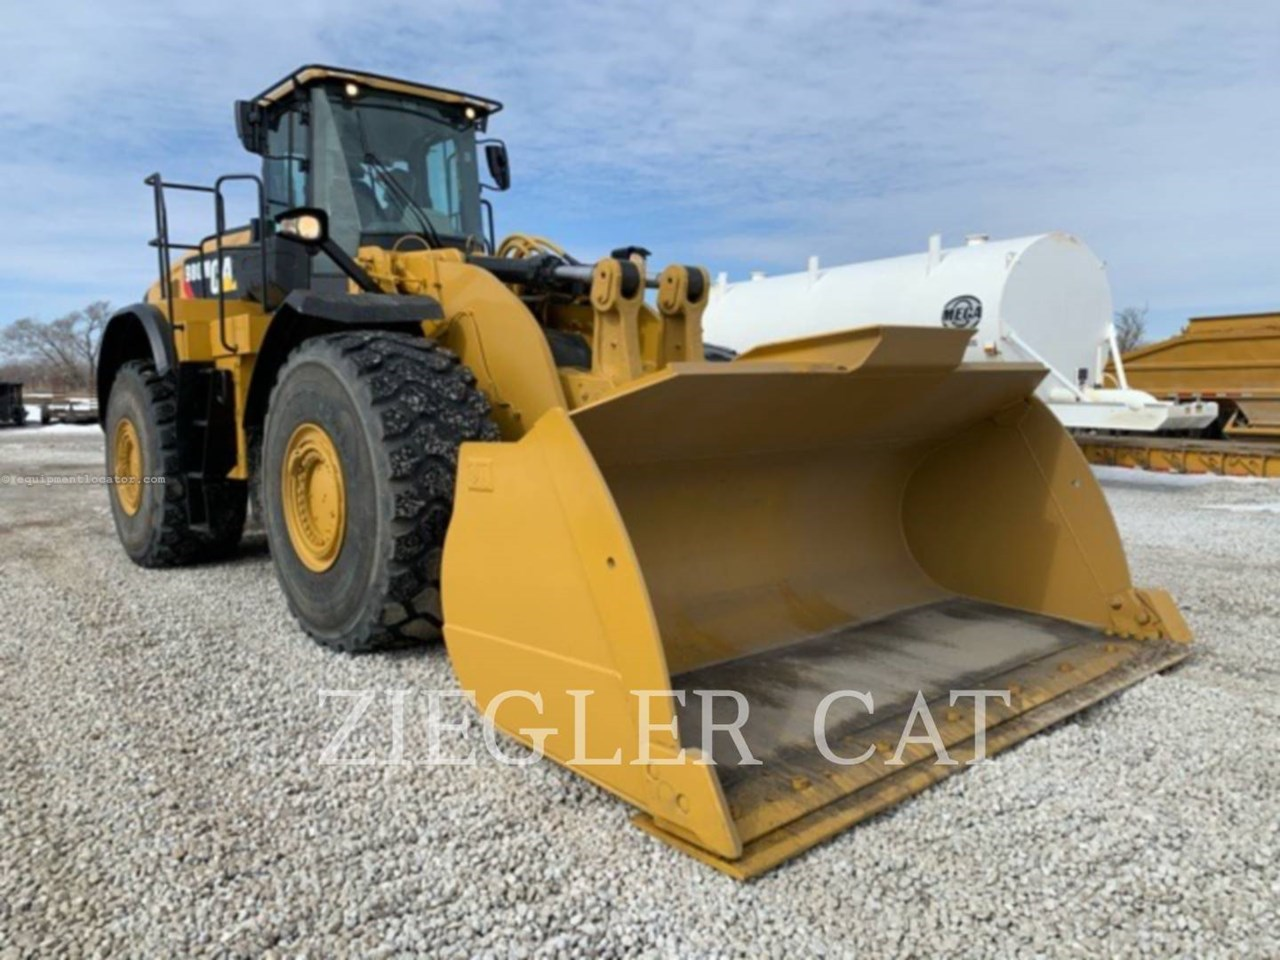 2018 Caterpillar 980M Image 1